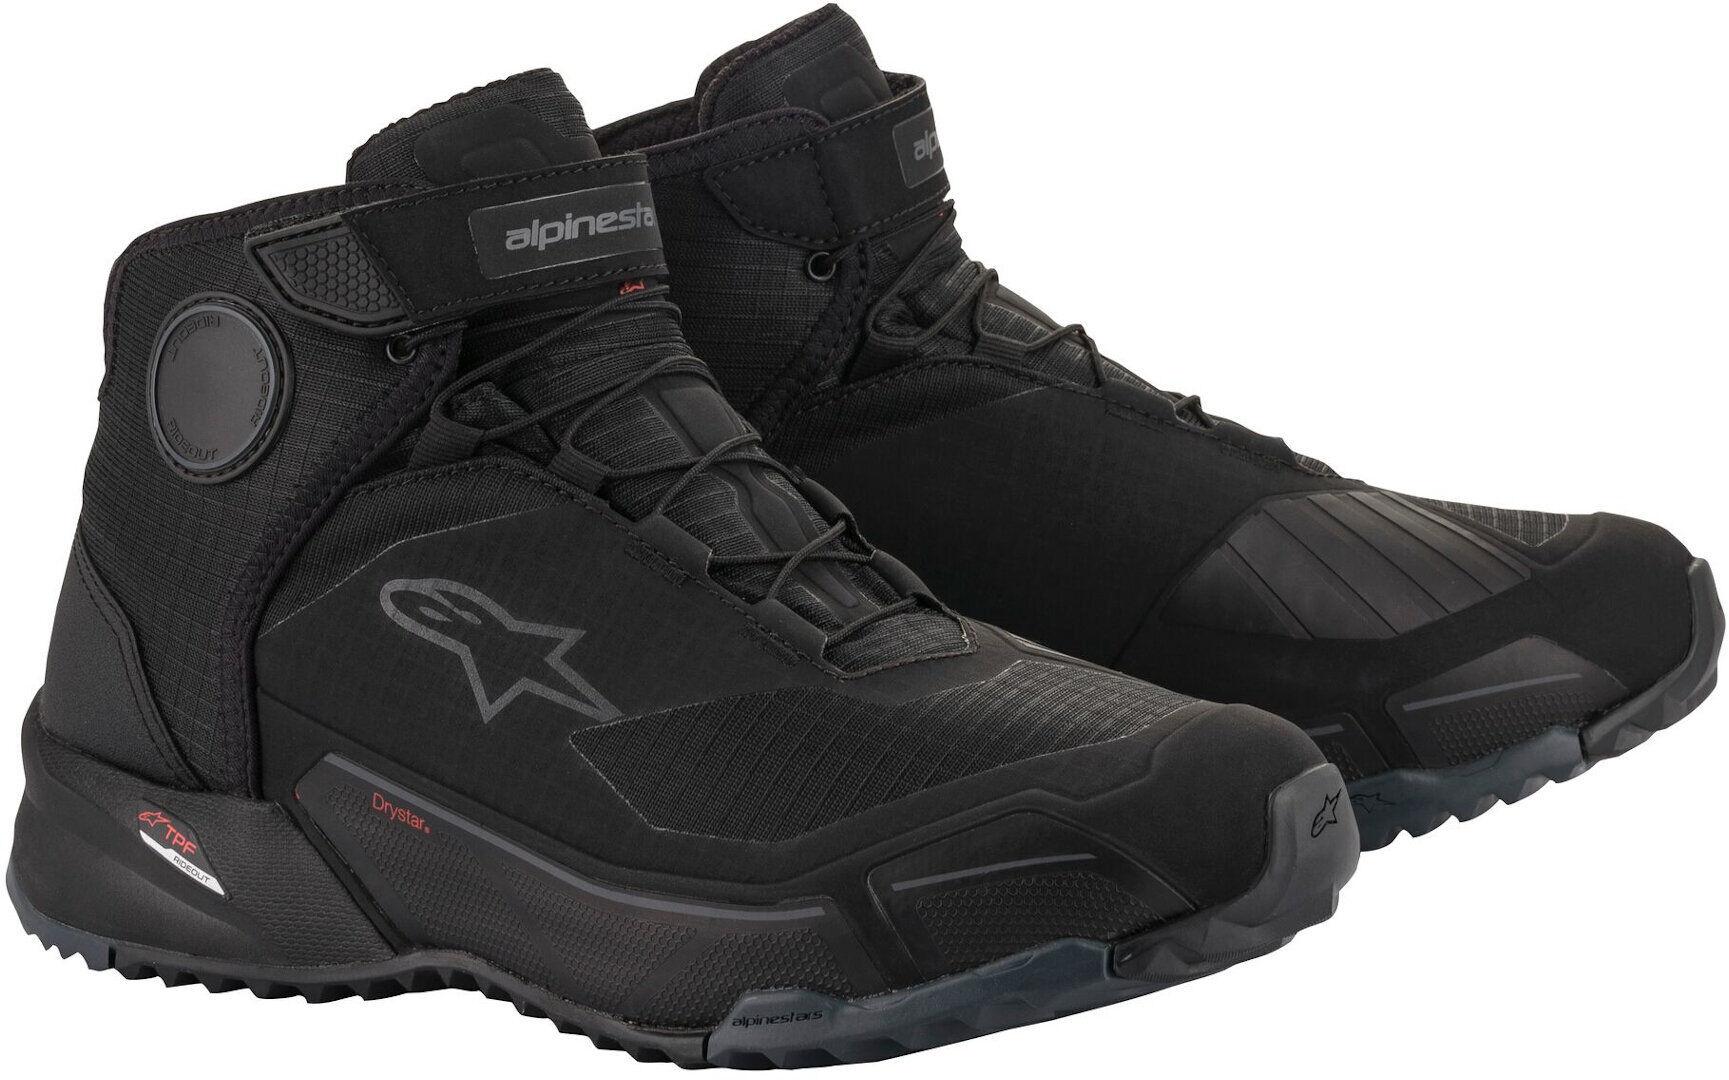 Alpinestars CR-X Drystar Motorcycle Shoes Black 48